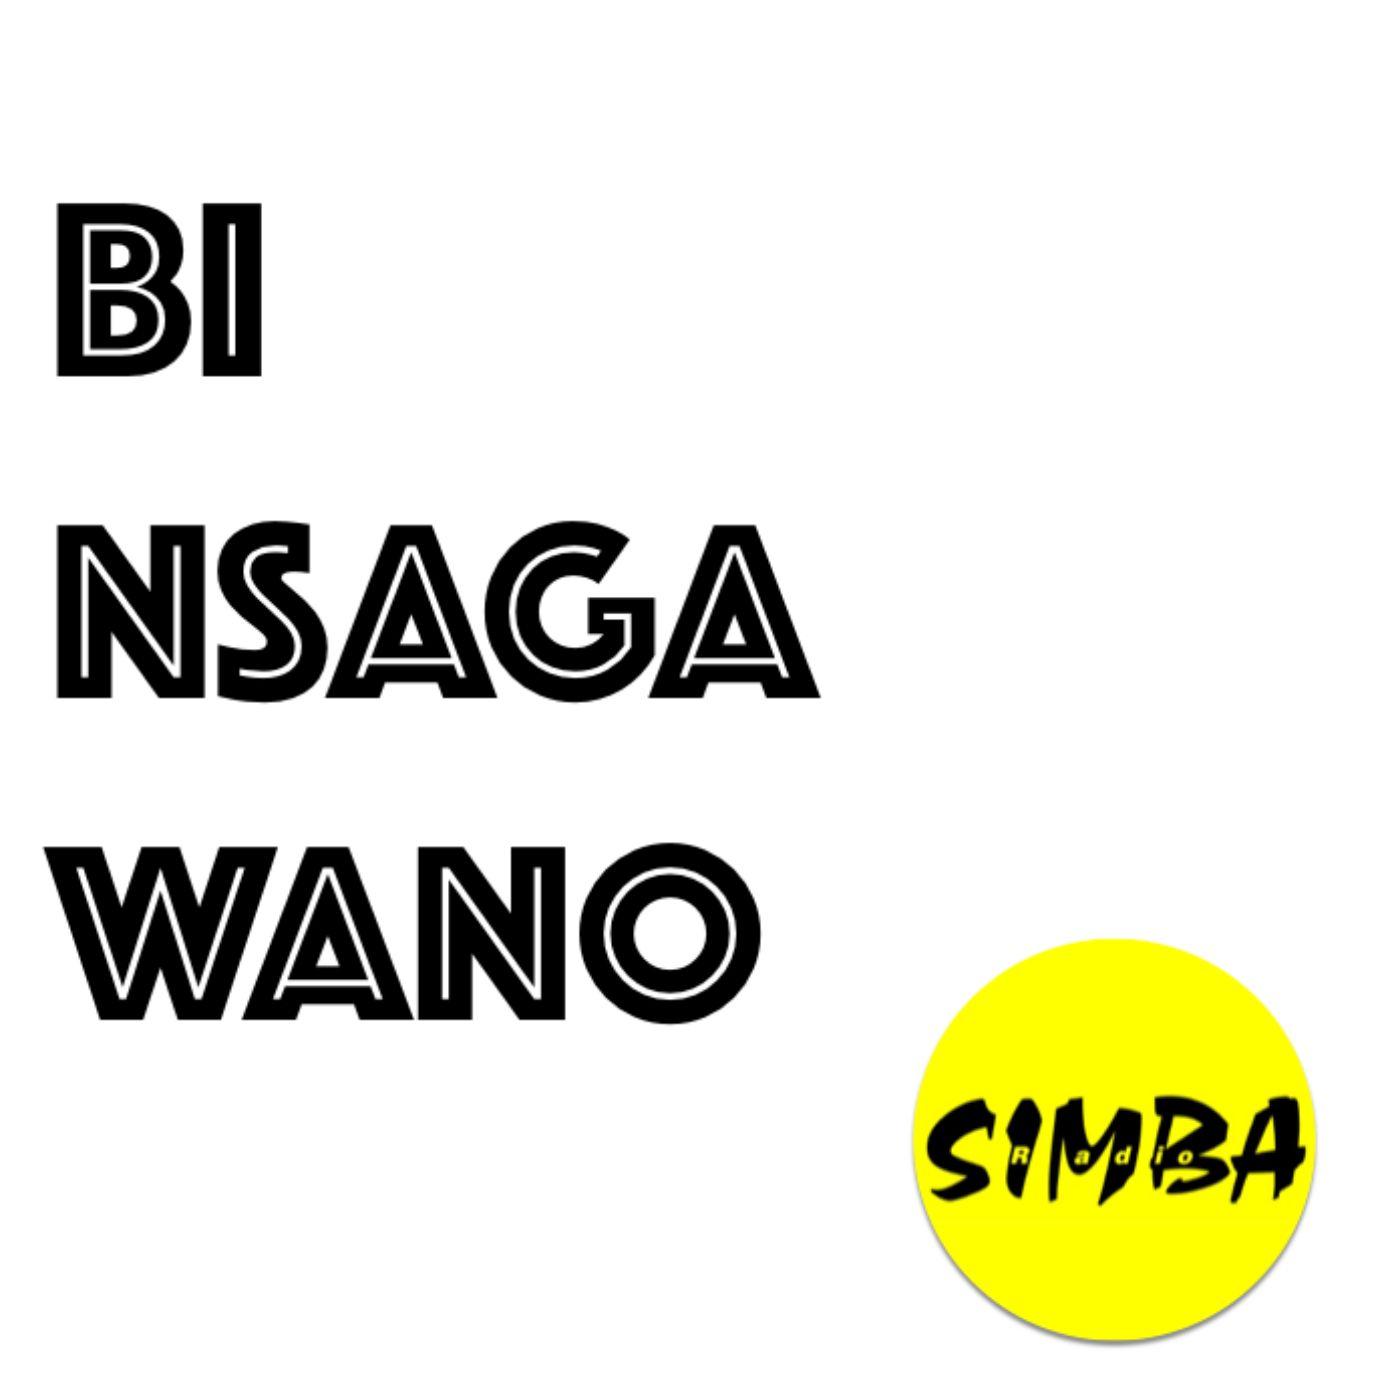 Binsangawano